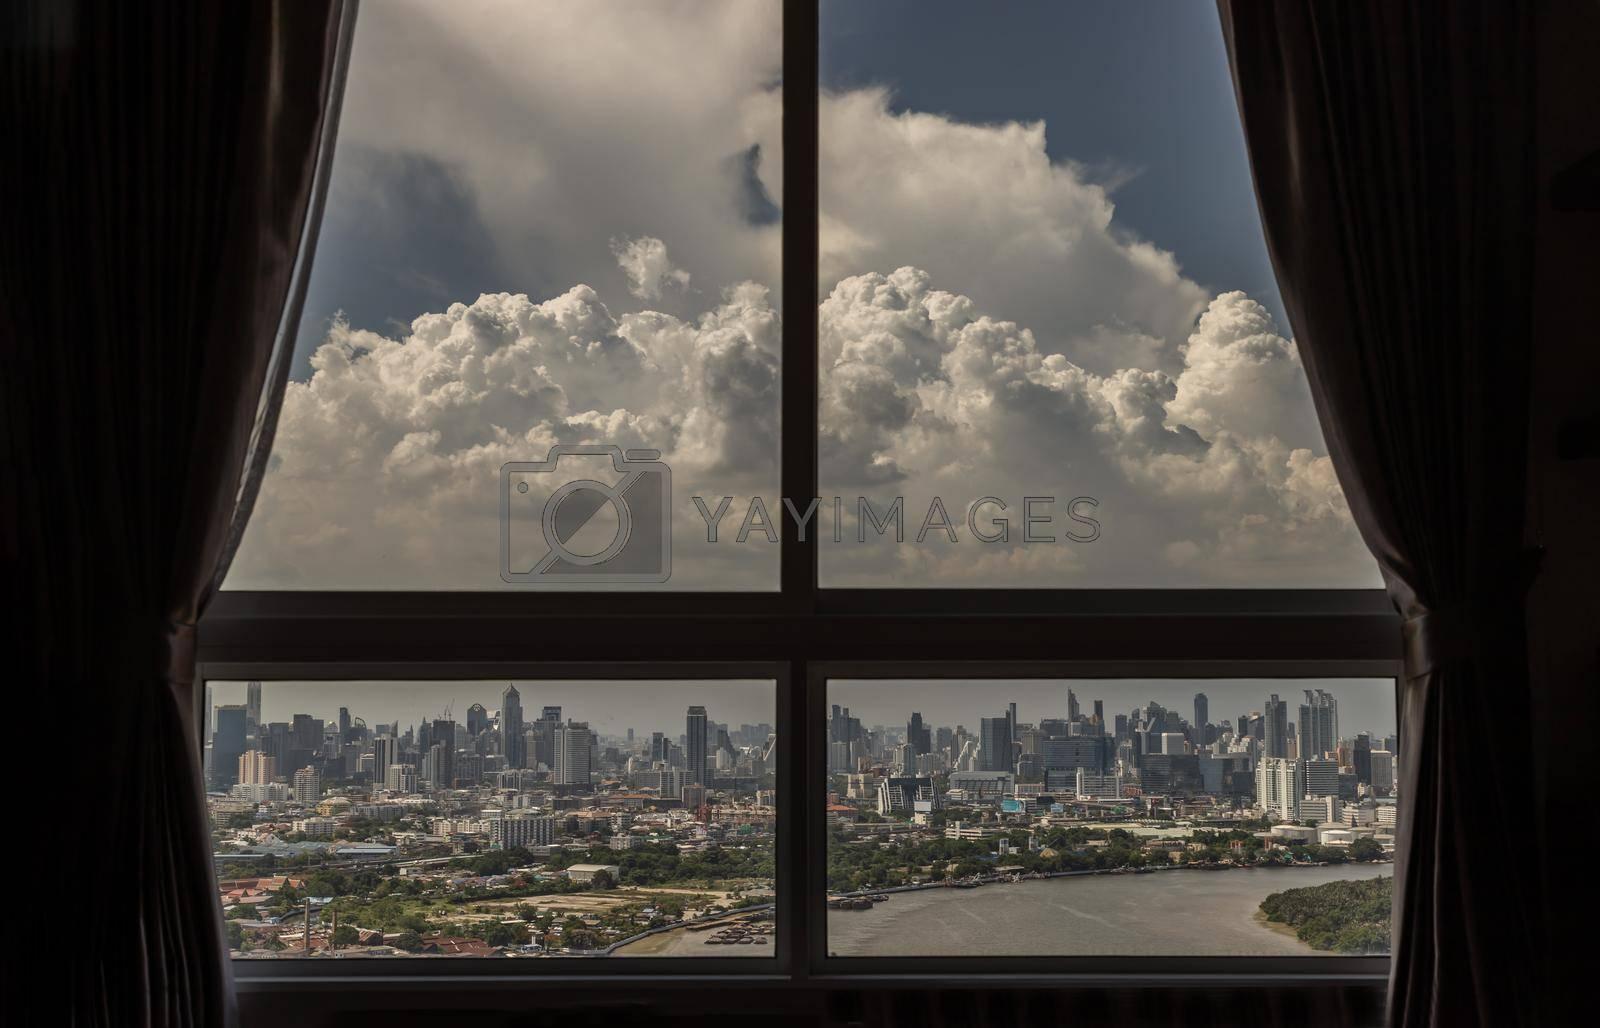 Bangkok, Thailand - 03 Jun, 2021 : Beautiful City with River view at afternoon. Can see through glass windows in the bedroom at bangkok. Selective focus.